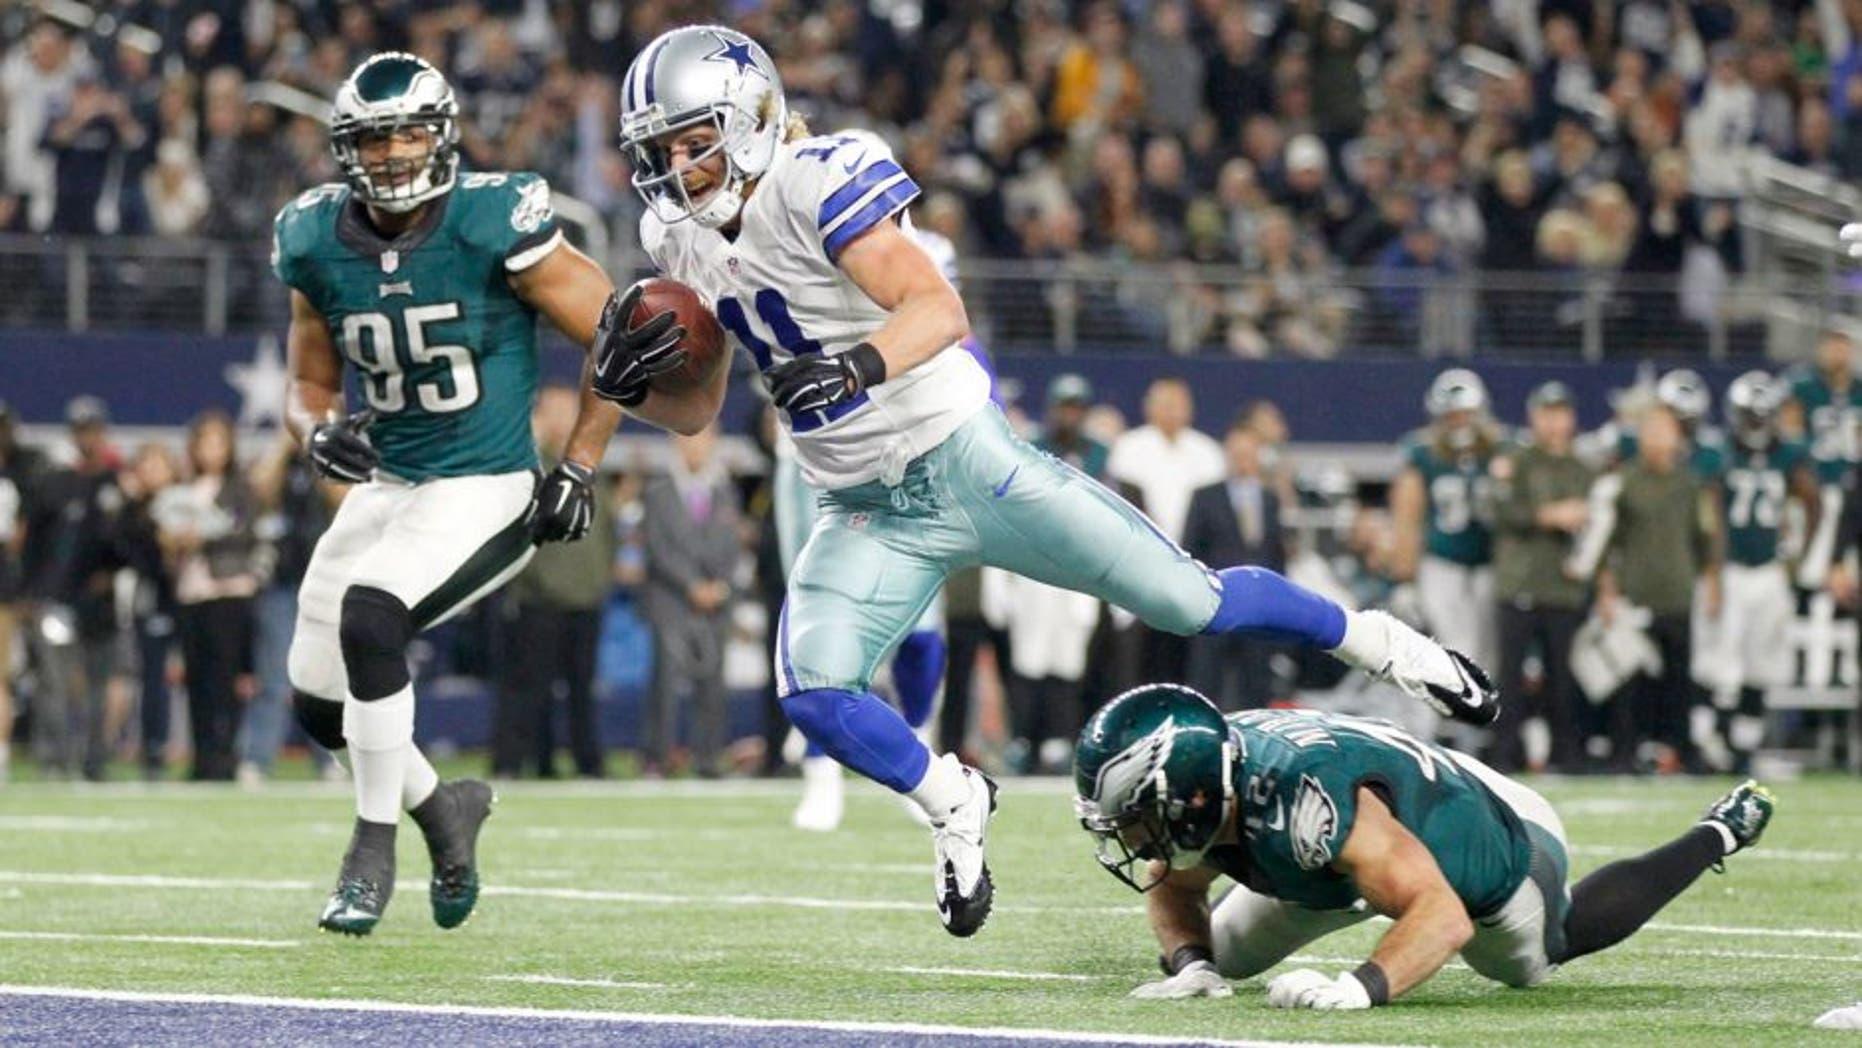 Nov 8, 2015; Arlington, TX, USA; Dallas Cowboys wide receiver Cole Beasley (11) scores a touchdown against Philadelphia Eagles free safety Chris Maragos (42) in the third quarter at AT&T Stadium. Mandatory Credit: Tim Heitman-USA TODAY Sports